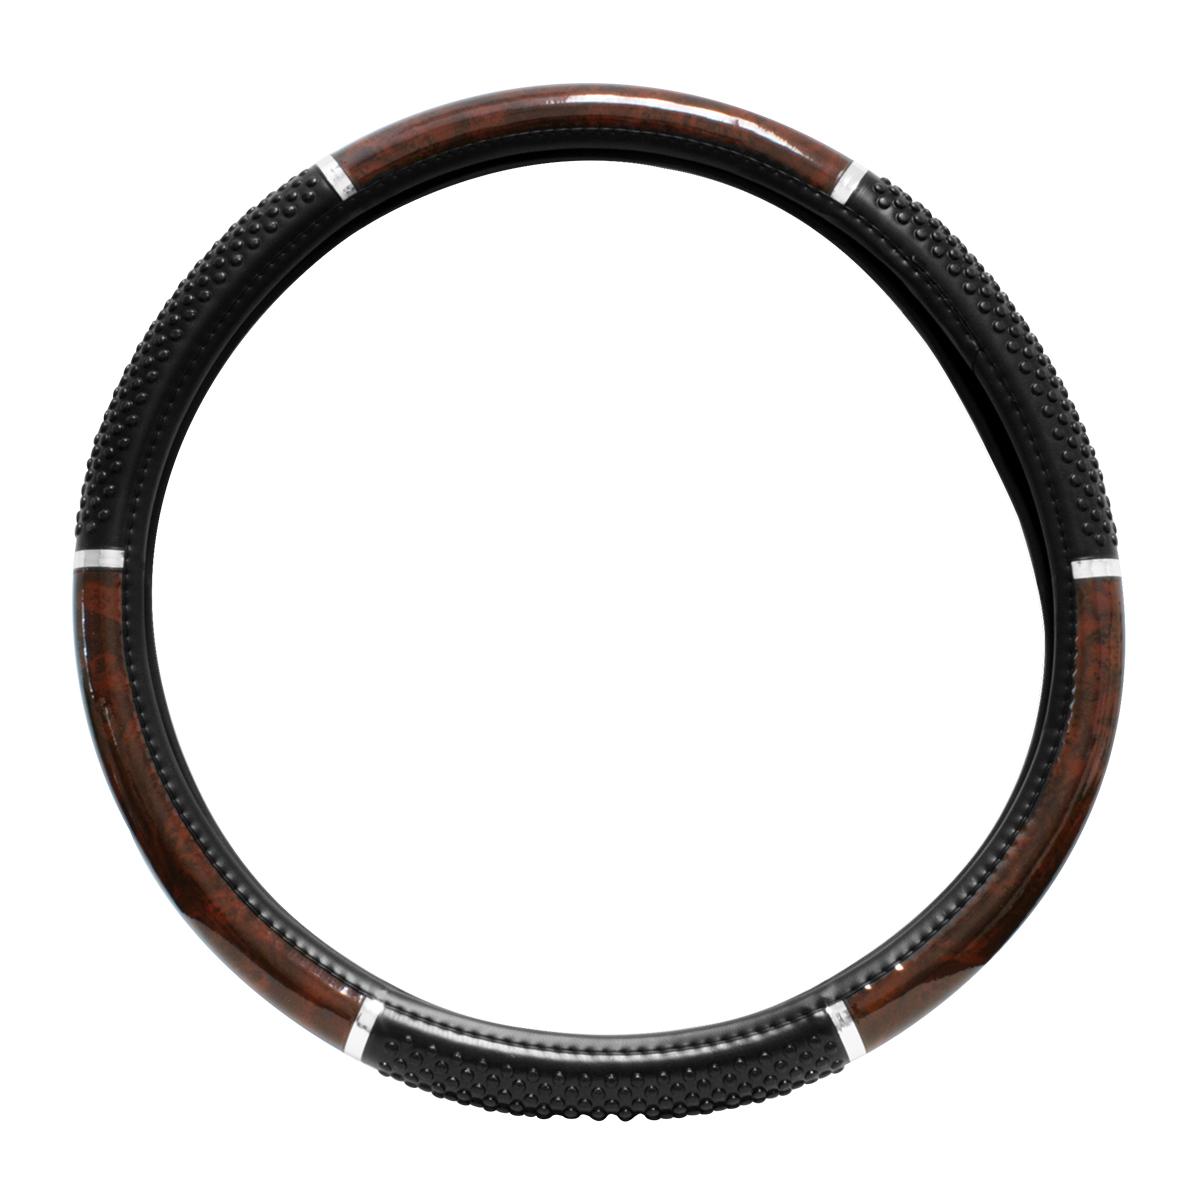 "Steering Wheel Cover, Dark Wood with Black soft raised Vinyl Beads for Semi Truck, 18"""